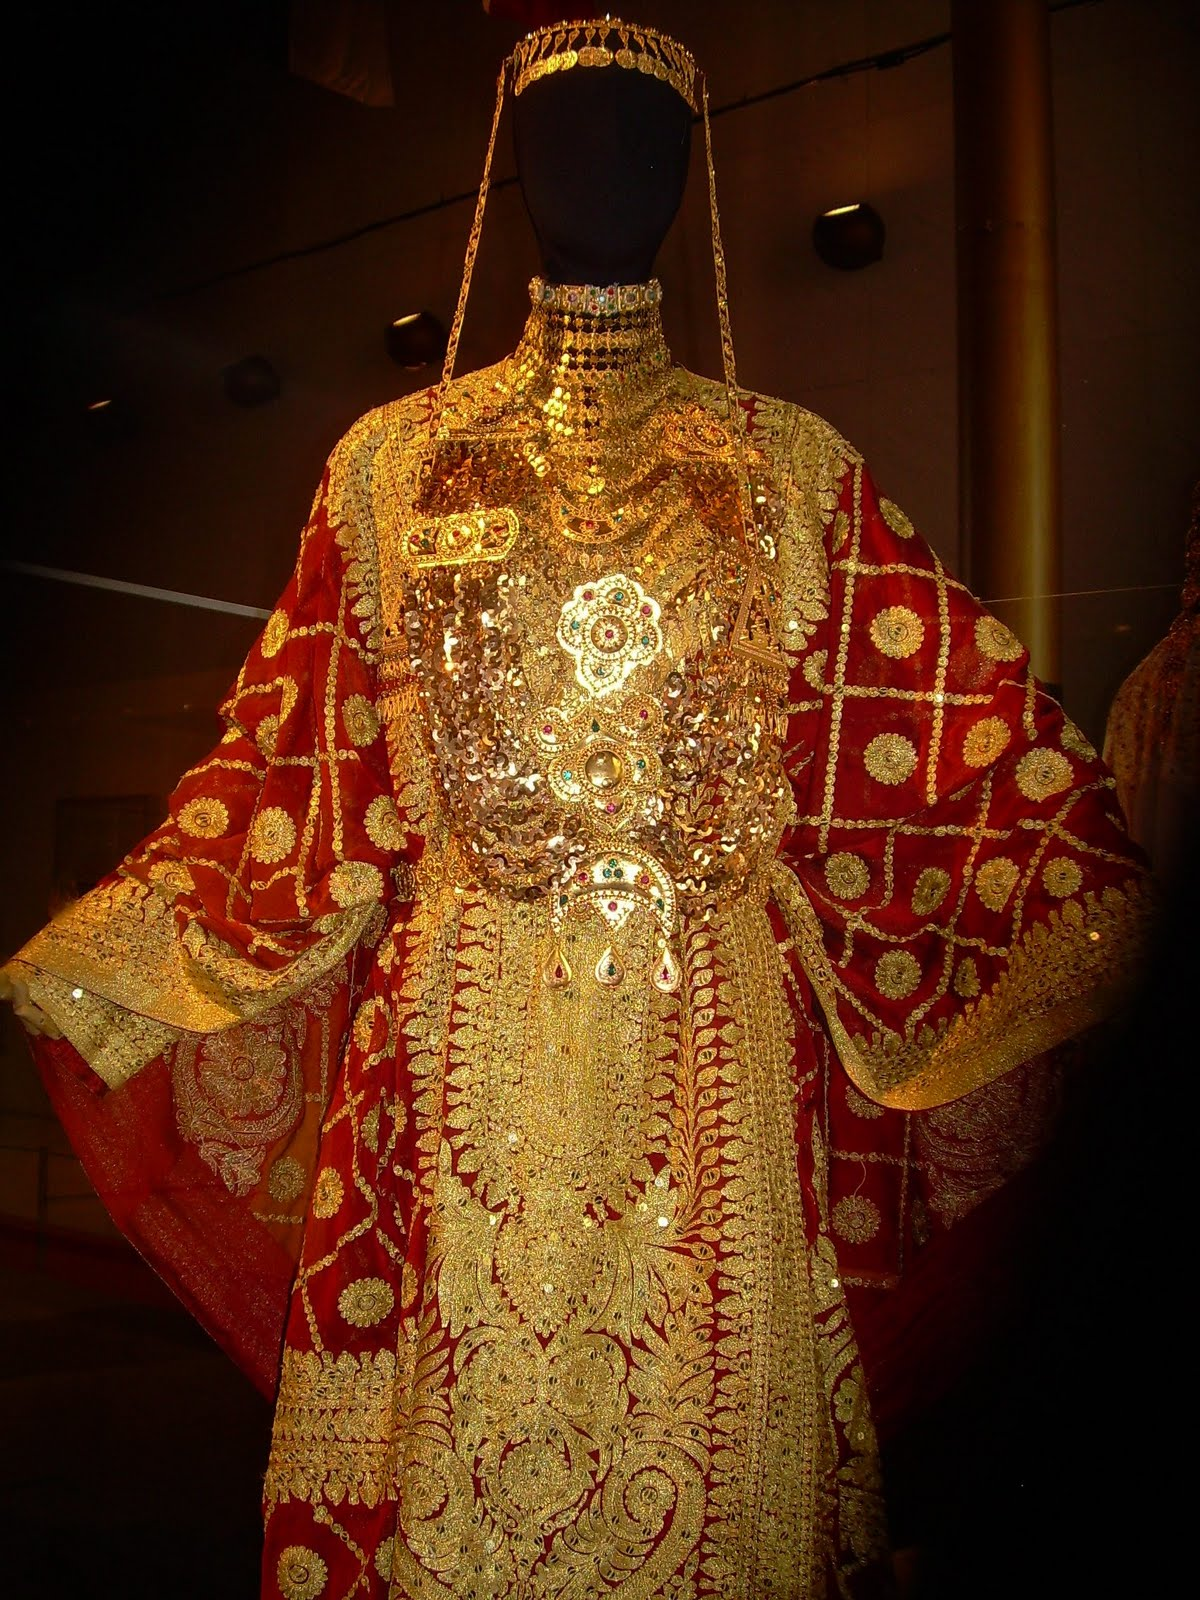 Wedding Dresses Qatar : Costume history is fun brides of the arab world kuwait